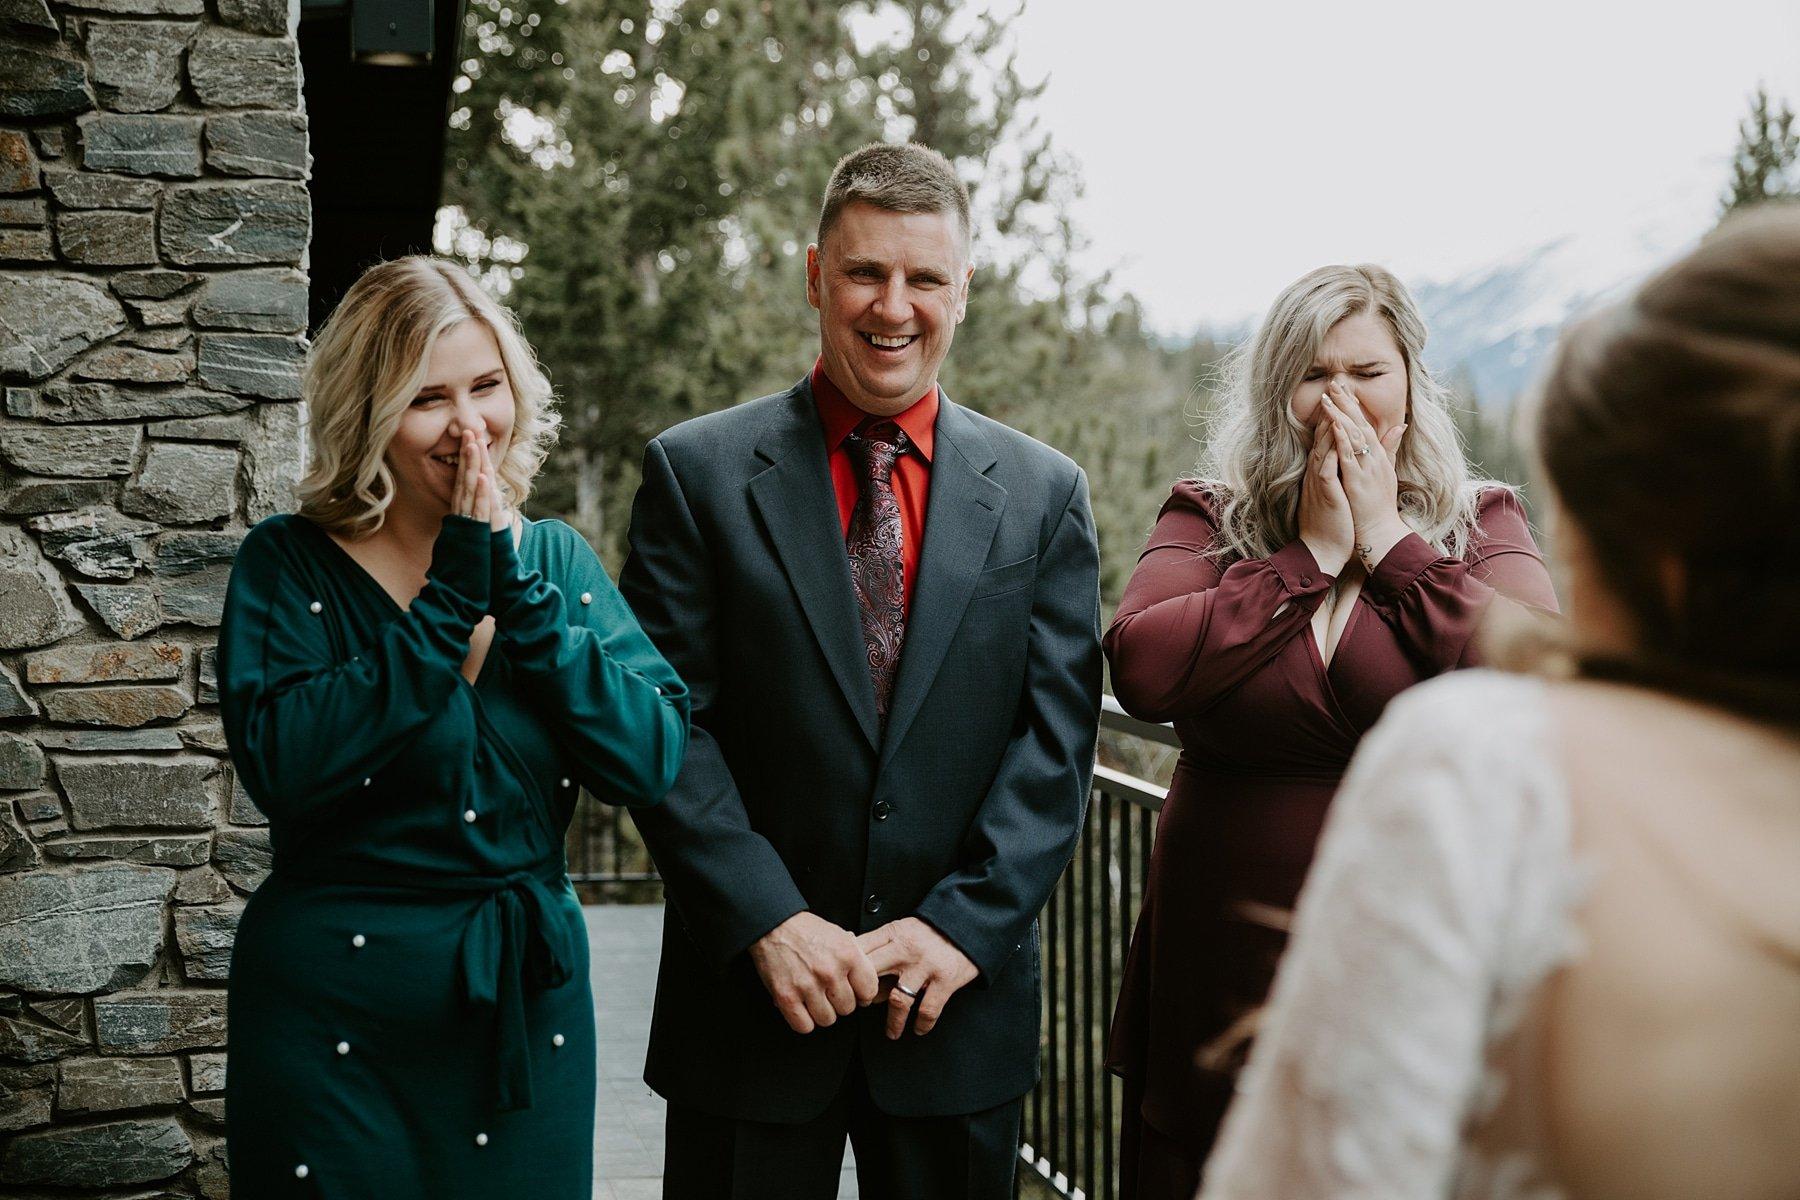 Pyramid Lake Resort Wedding first look with Dad